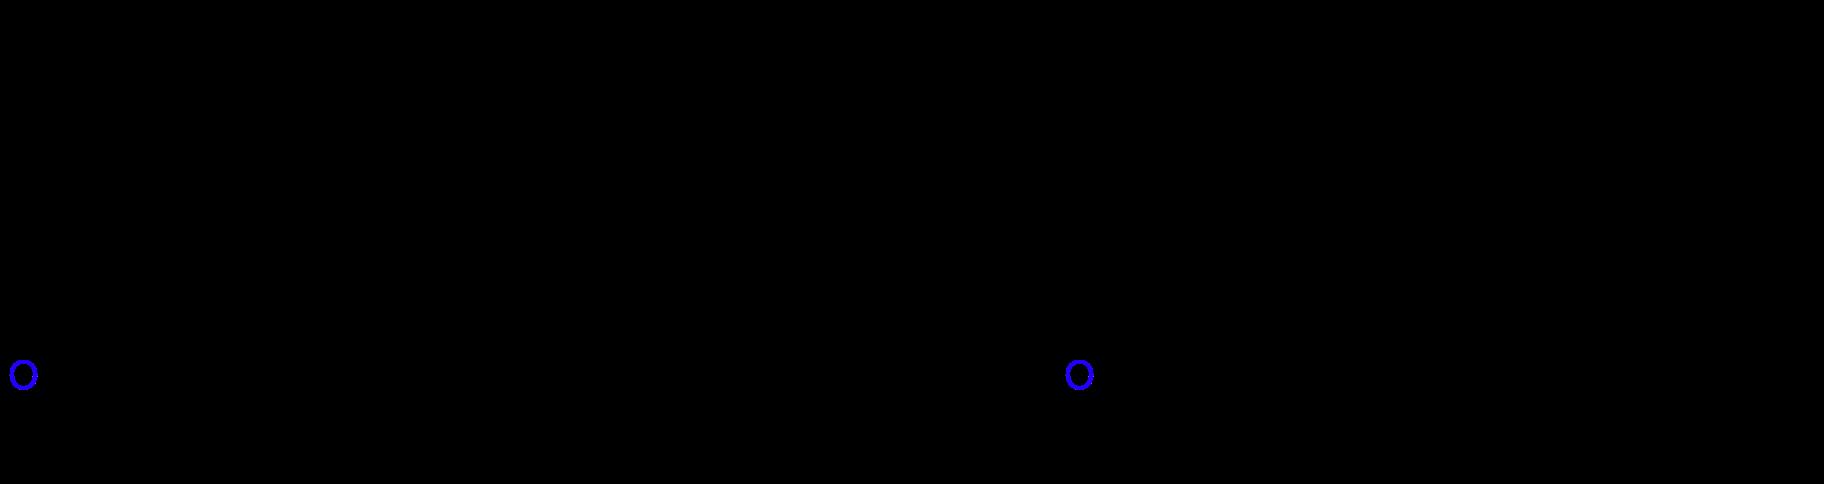 image116.png